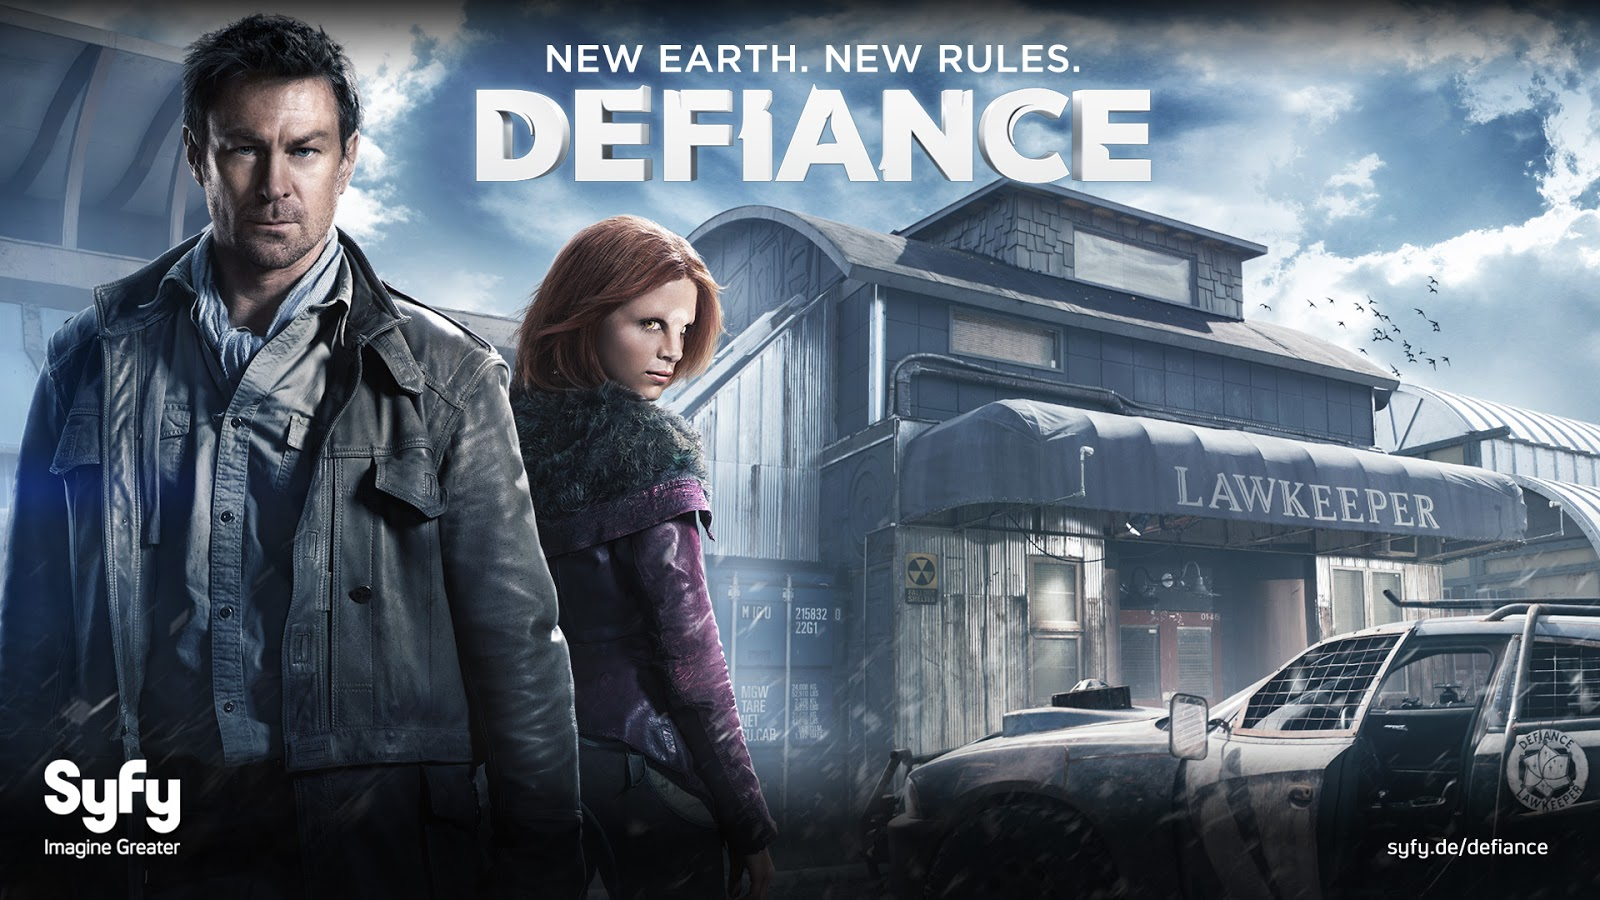 Defiance+title+card.jpg